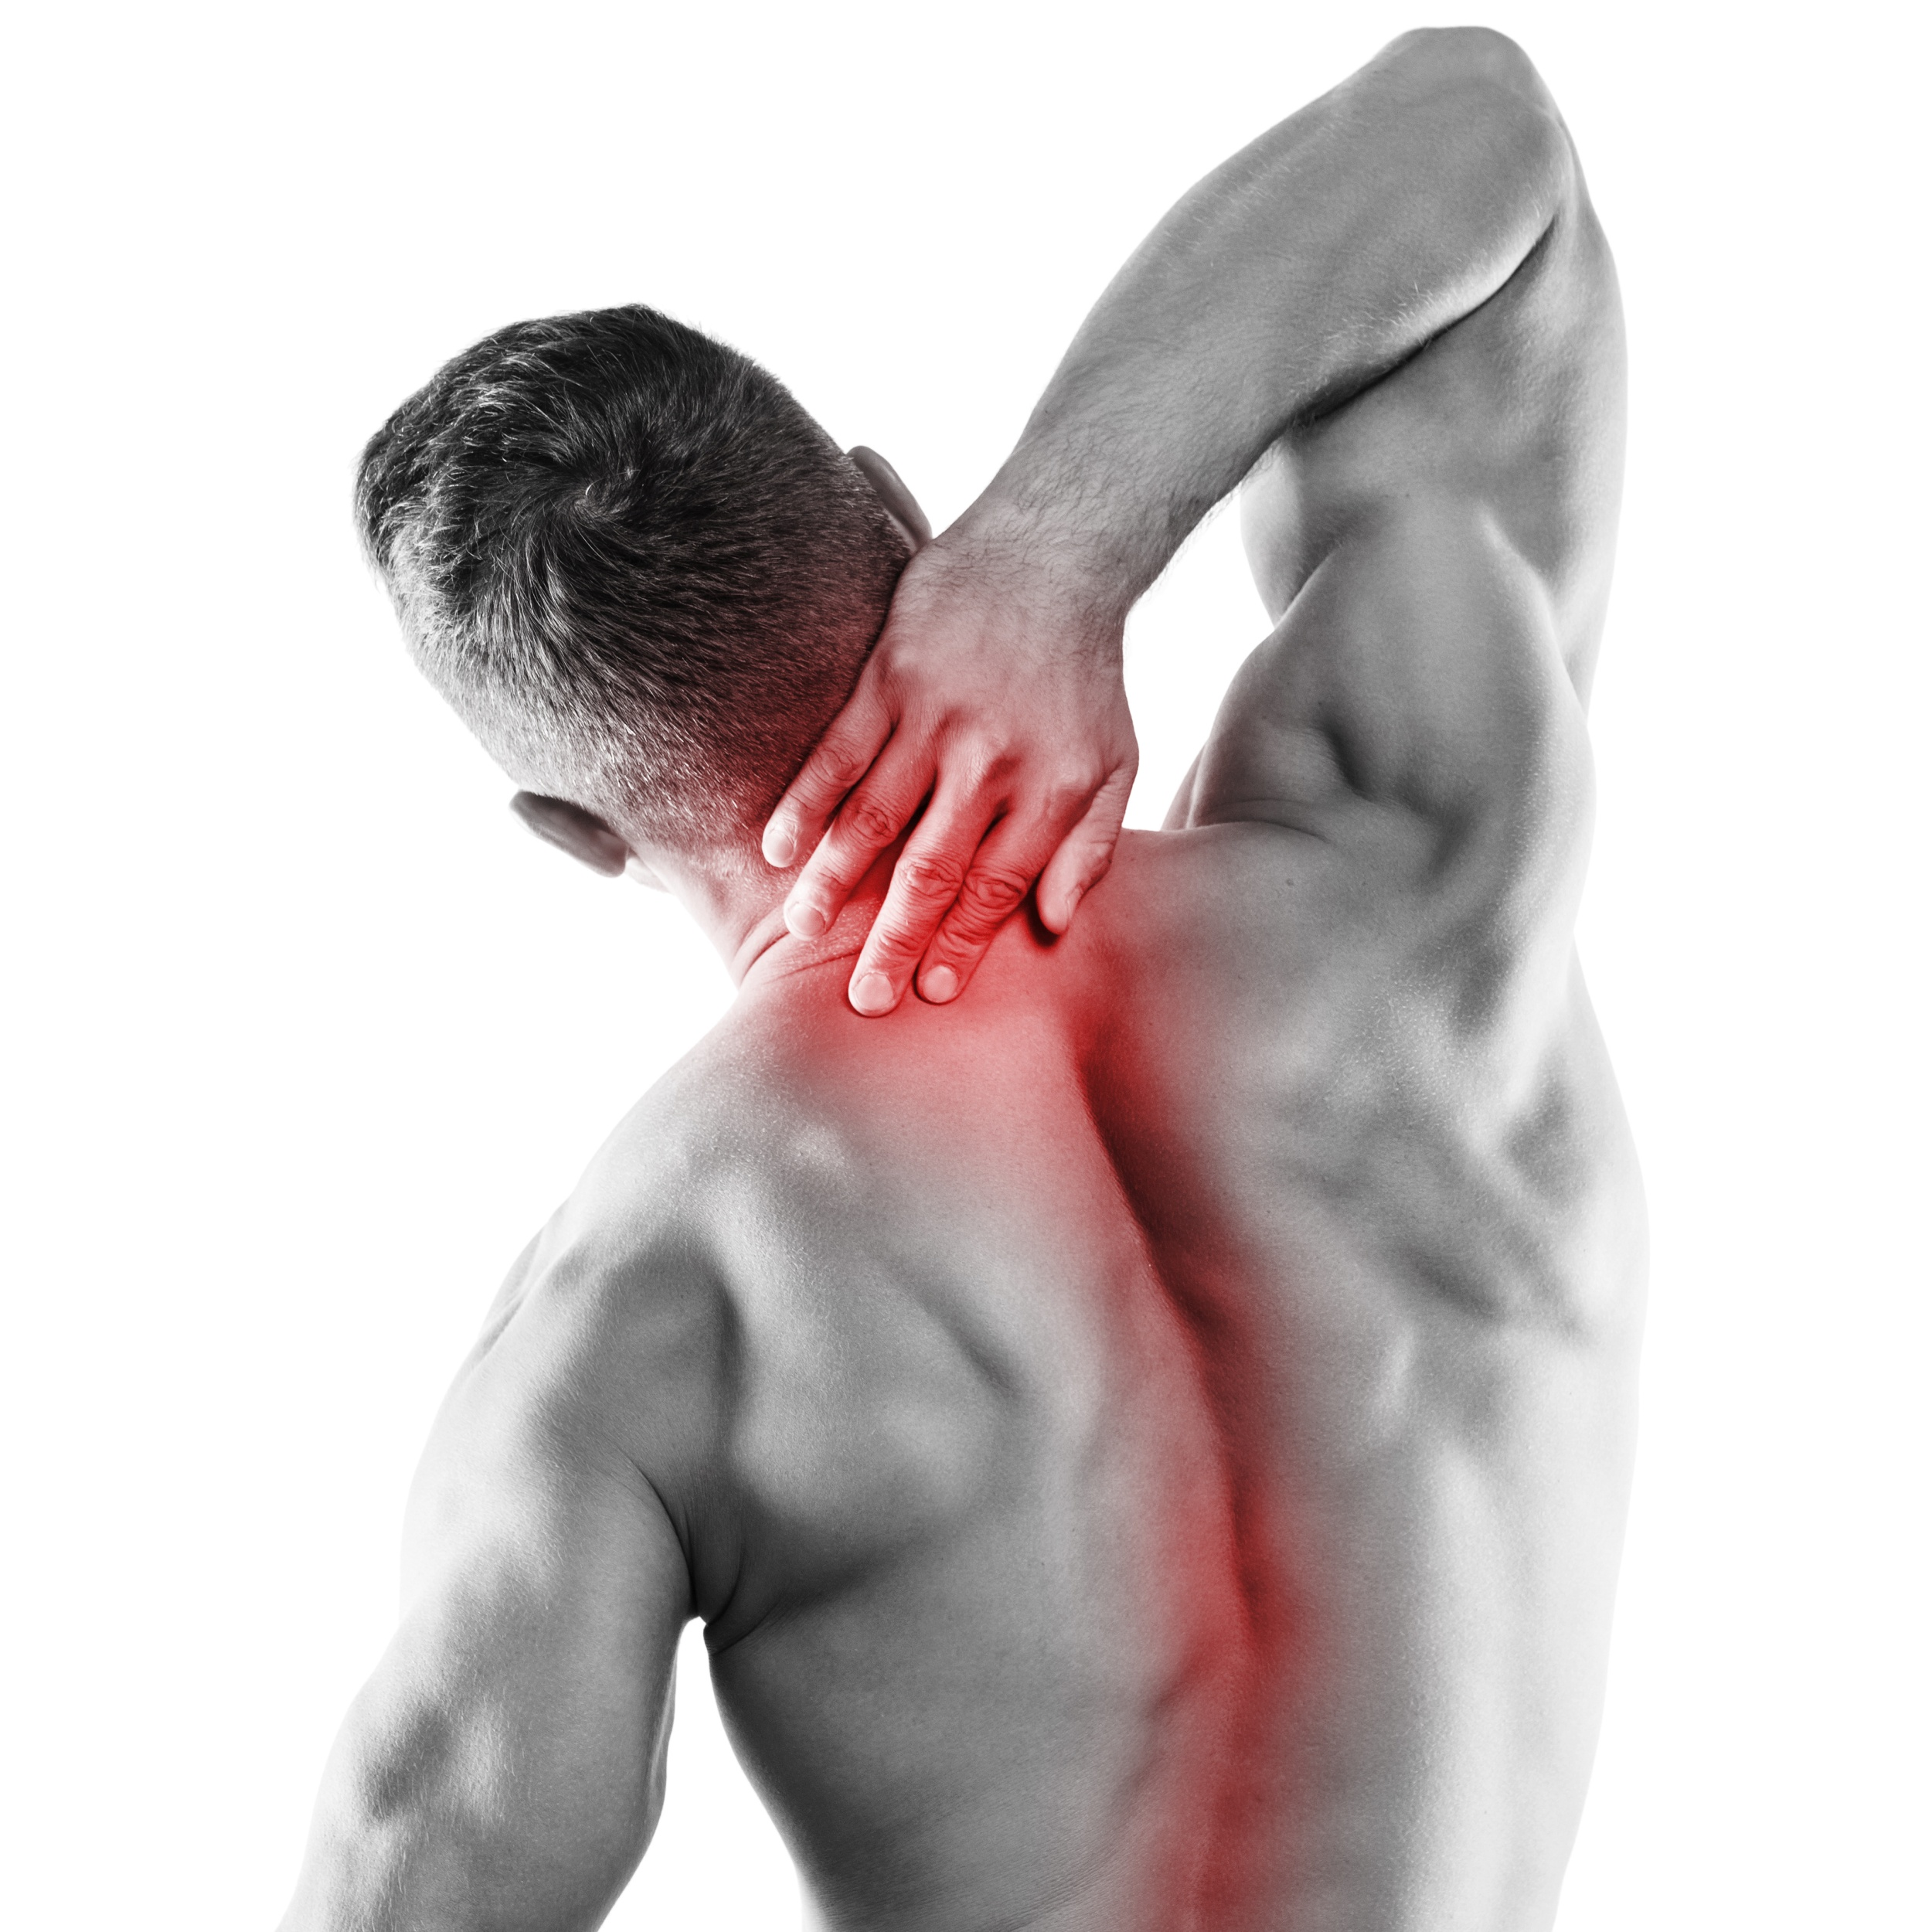 Contratura Muscular Causas Como Evitar Tratamentos